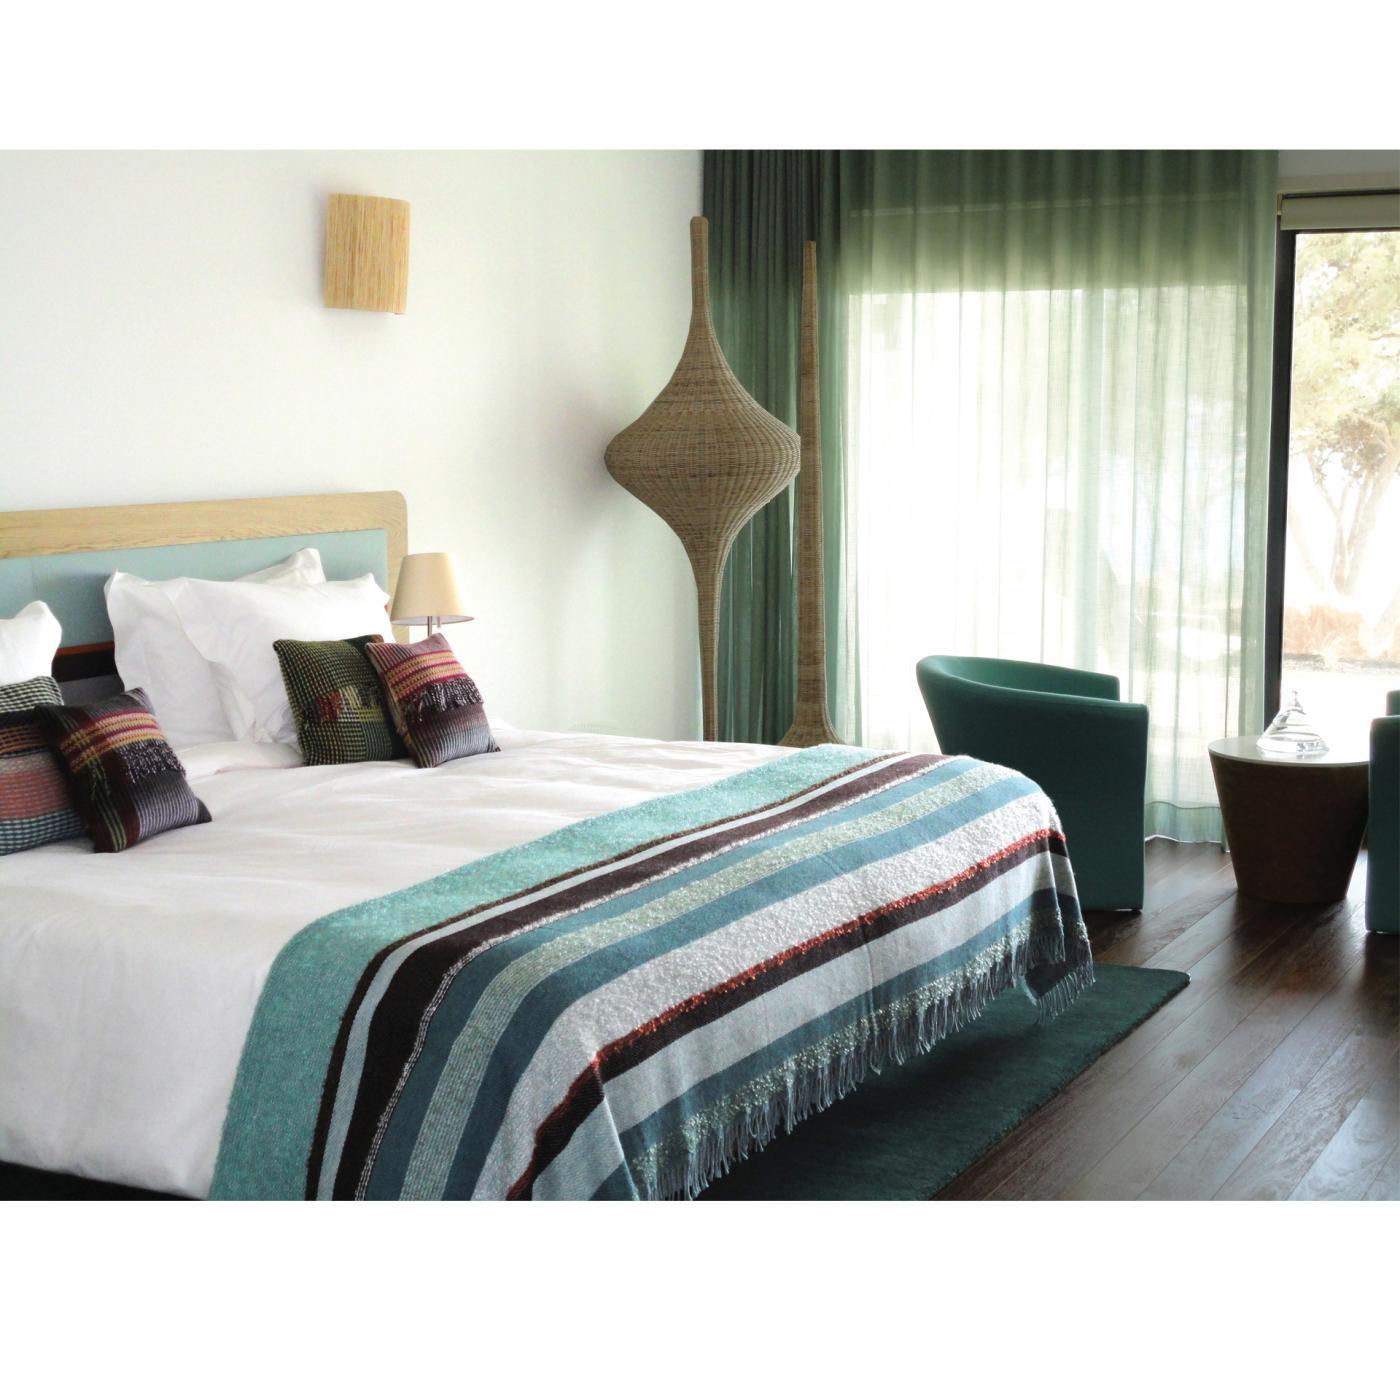 Martinhal Resort – Hotel bedspreads